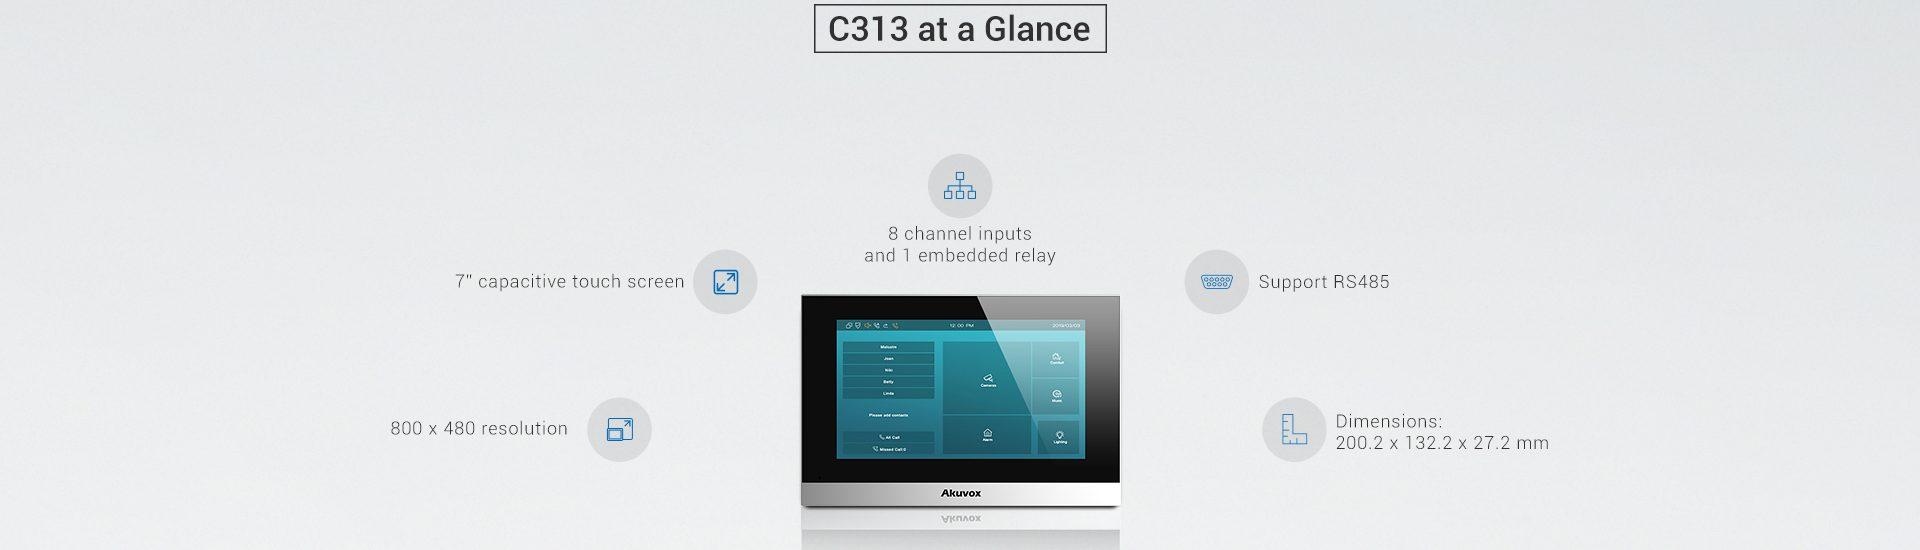 Akuvox C313